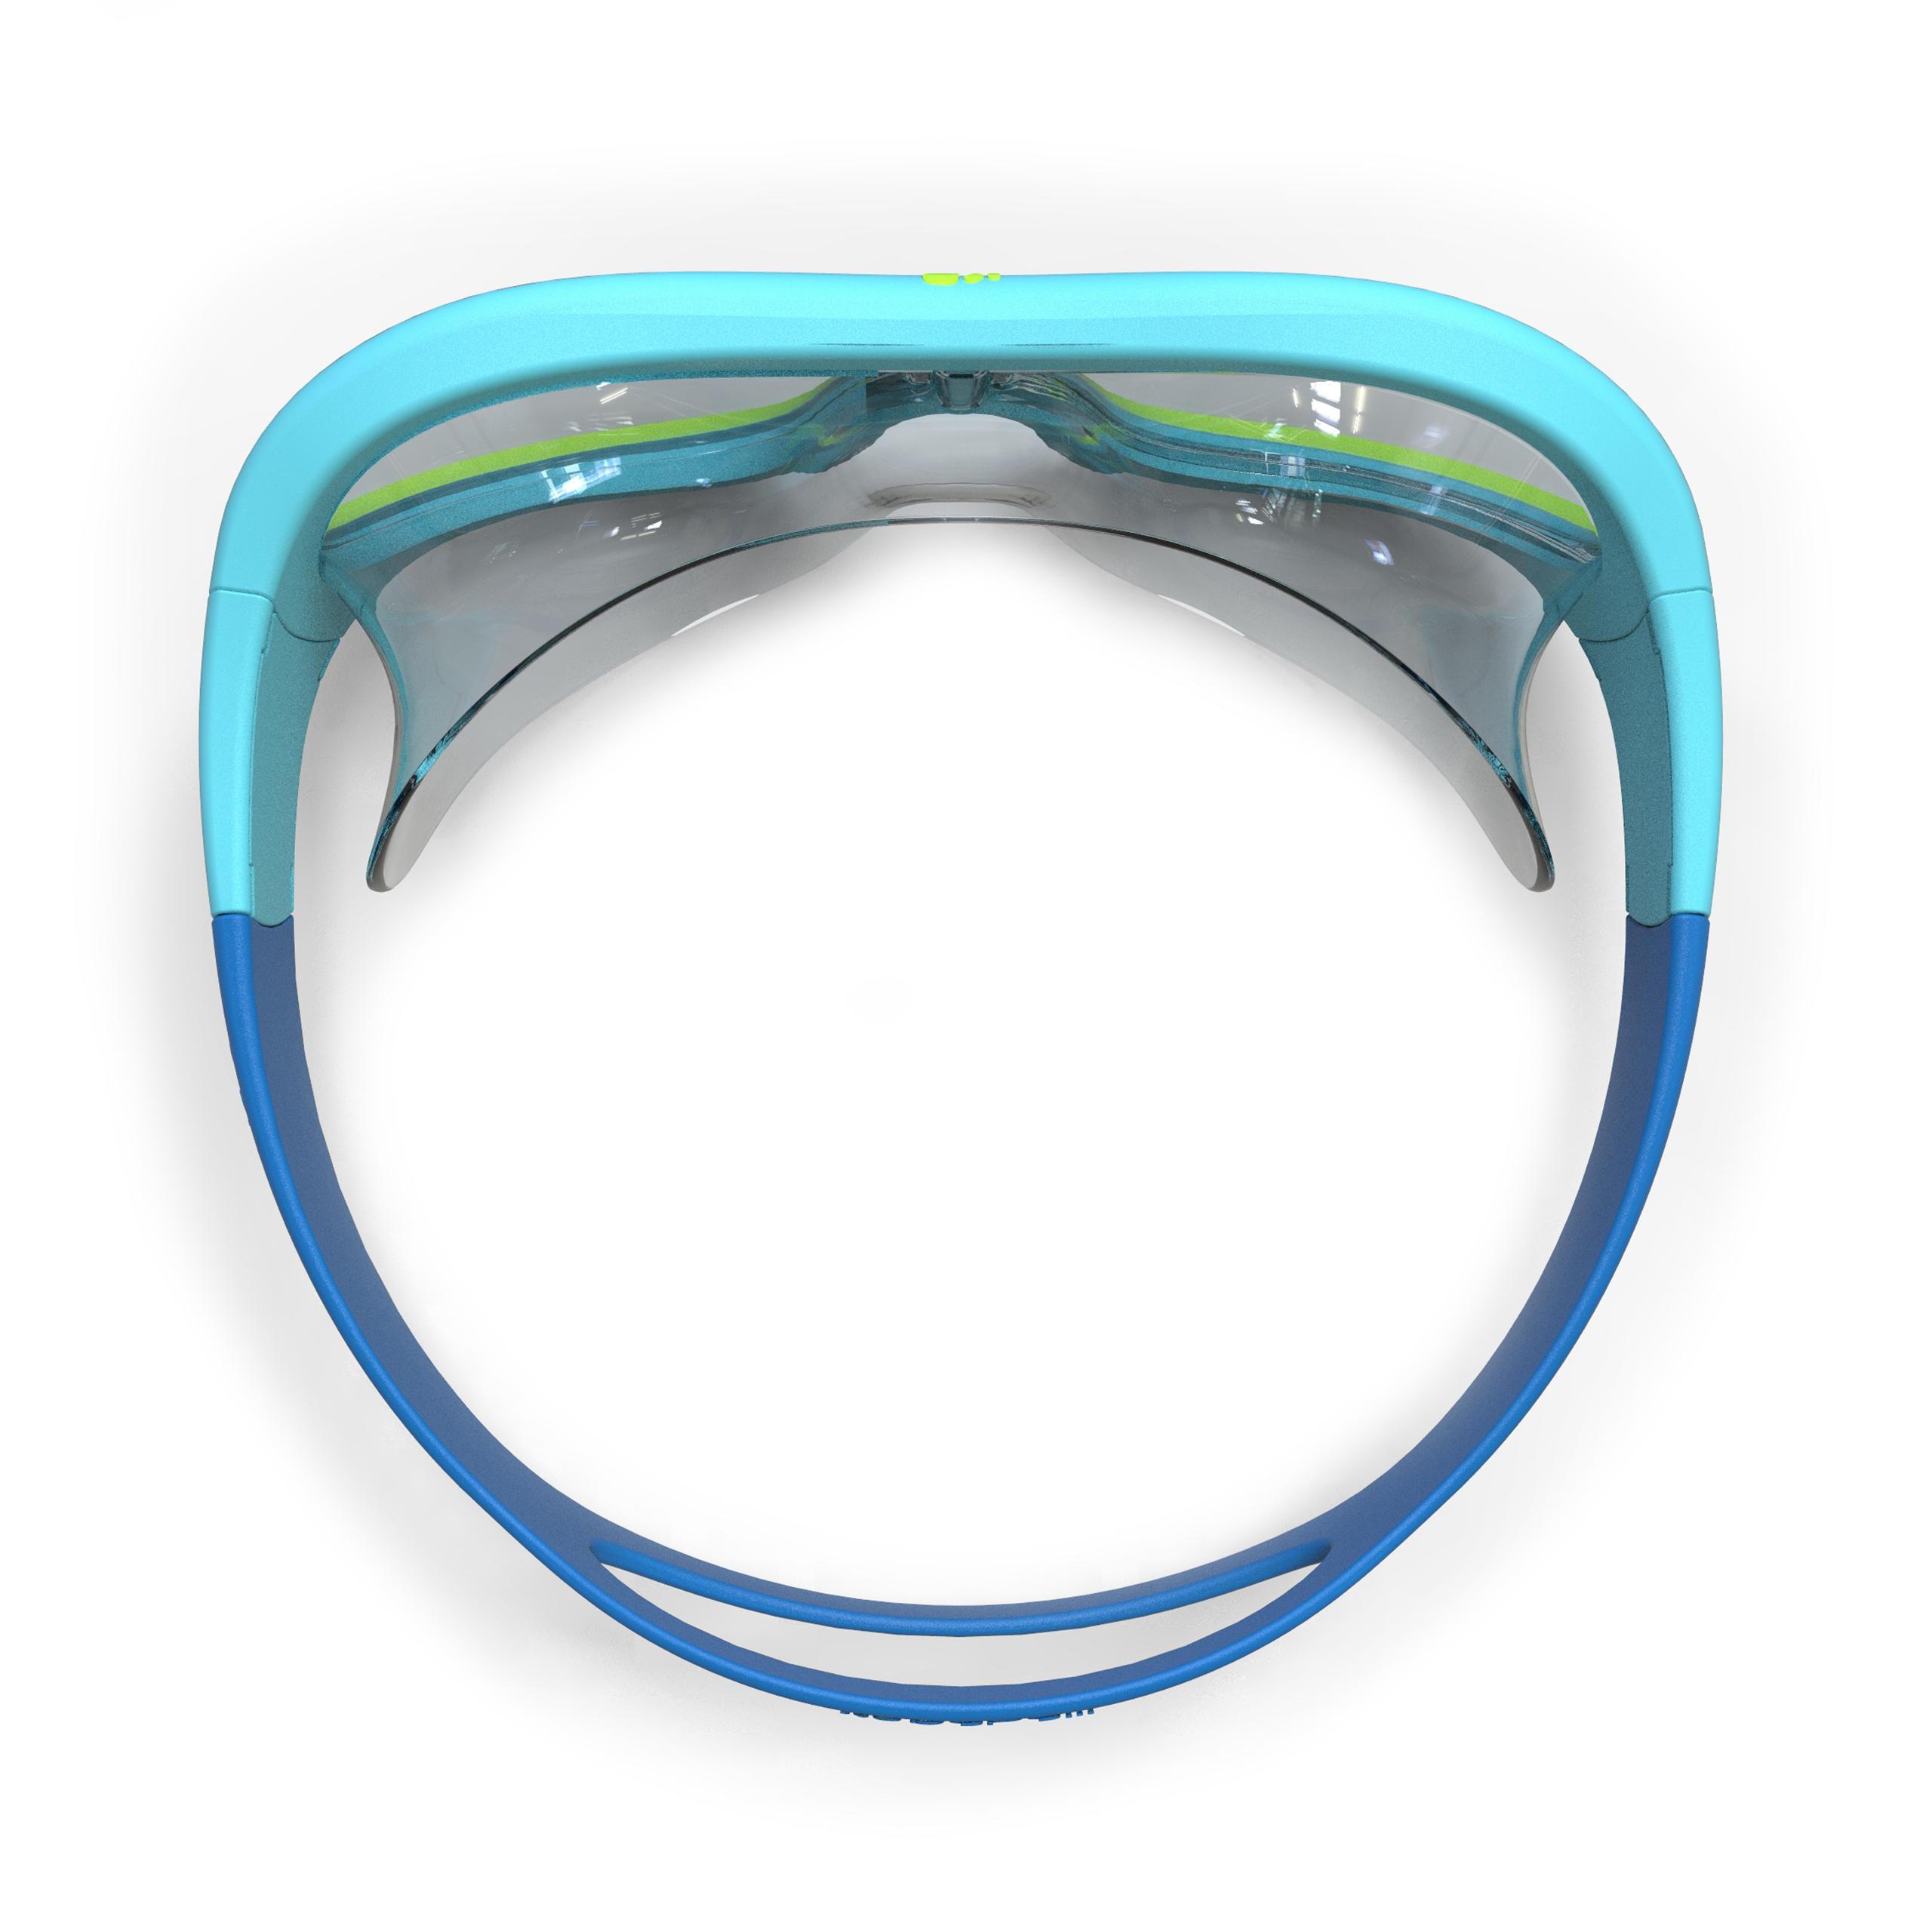 Swimdow Swimming Mask Size S - Blue Green